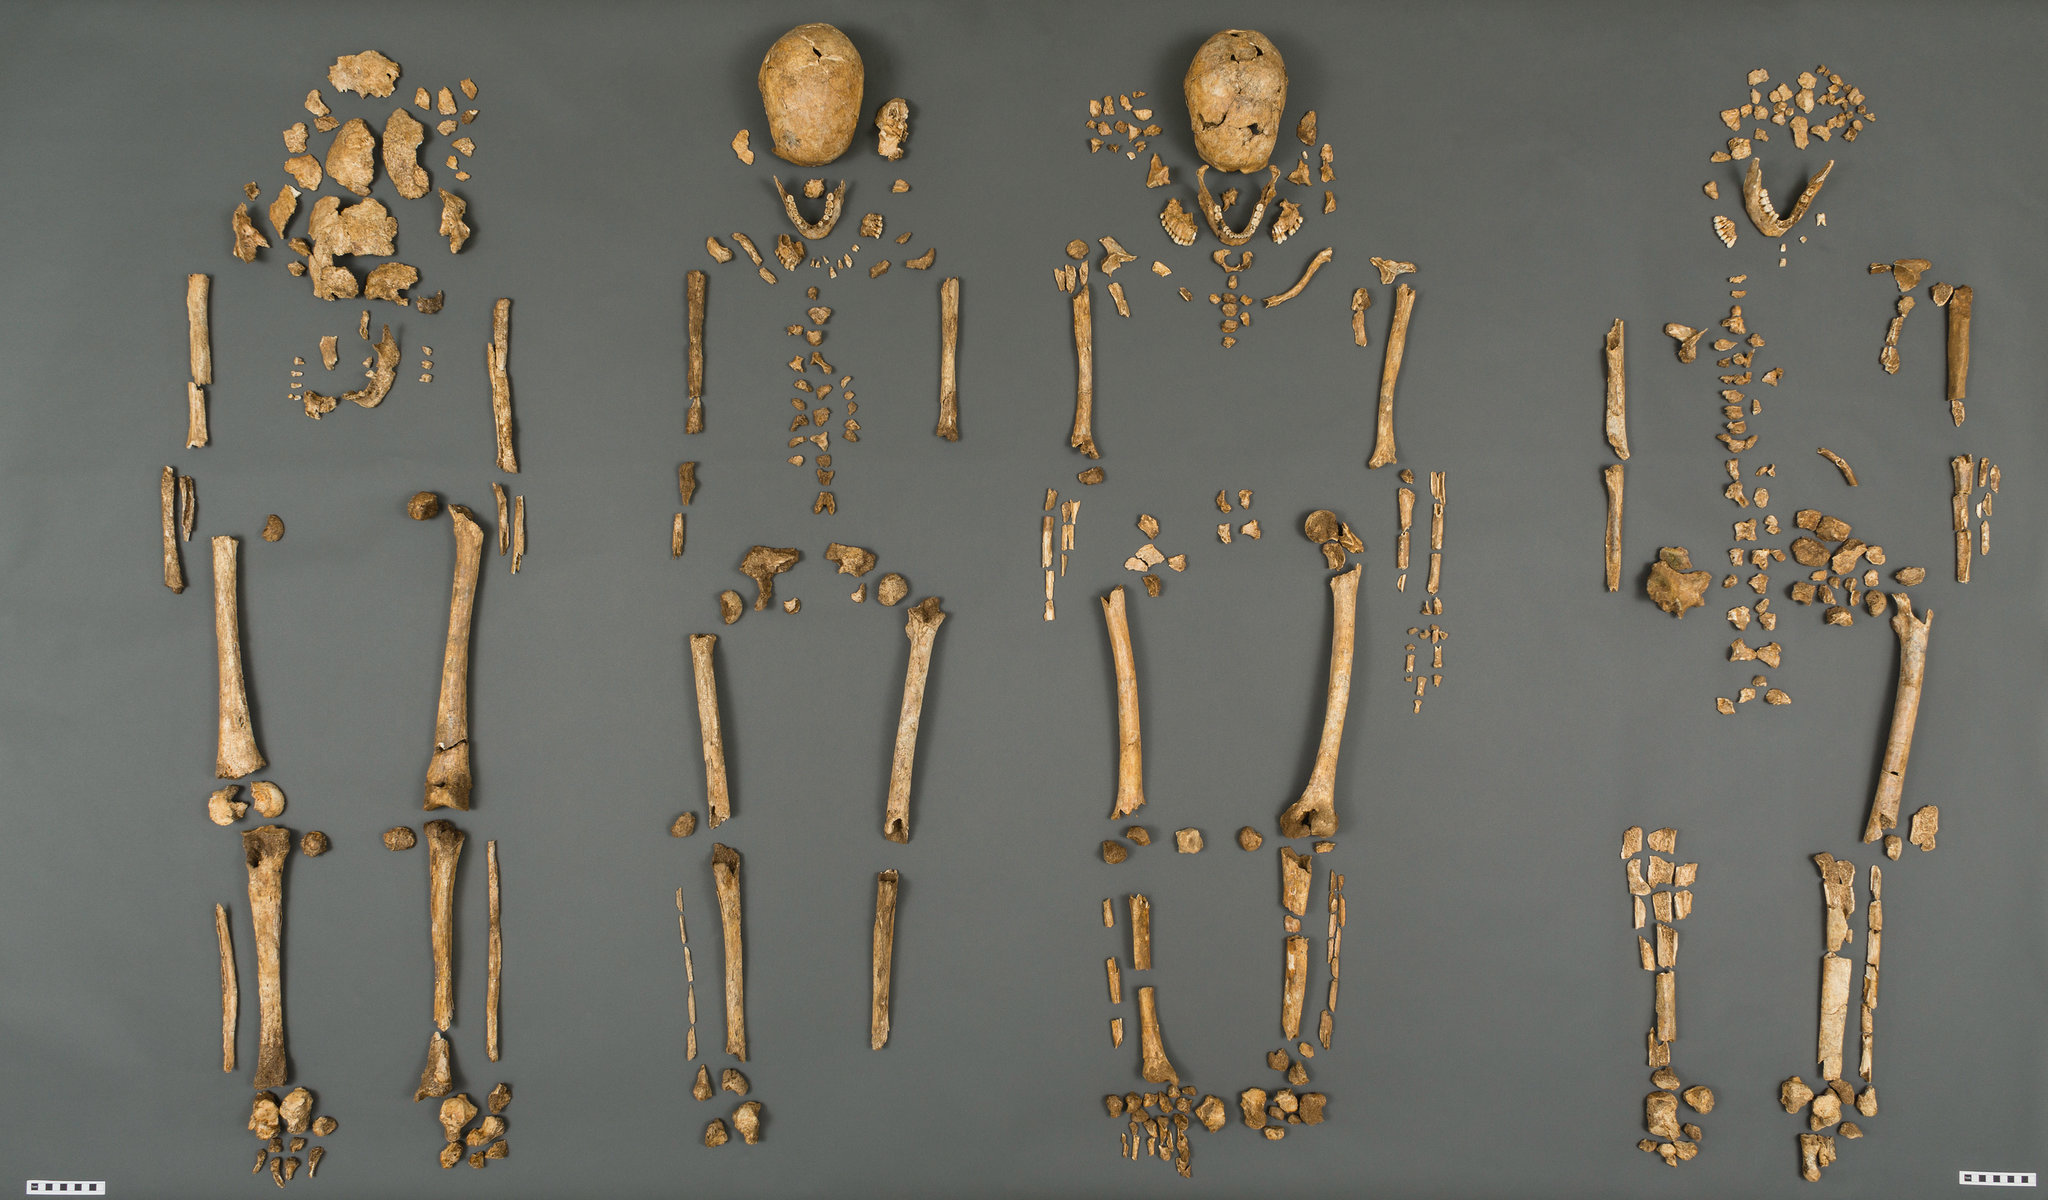 Challenger Human Remains